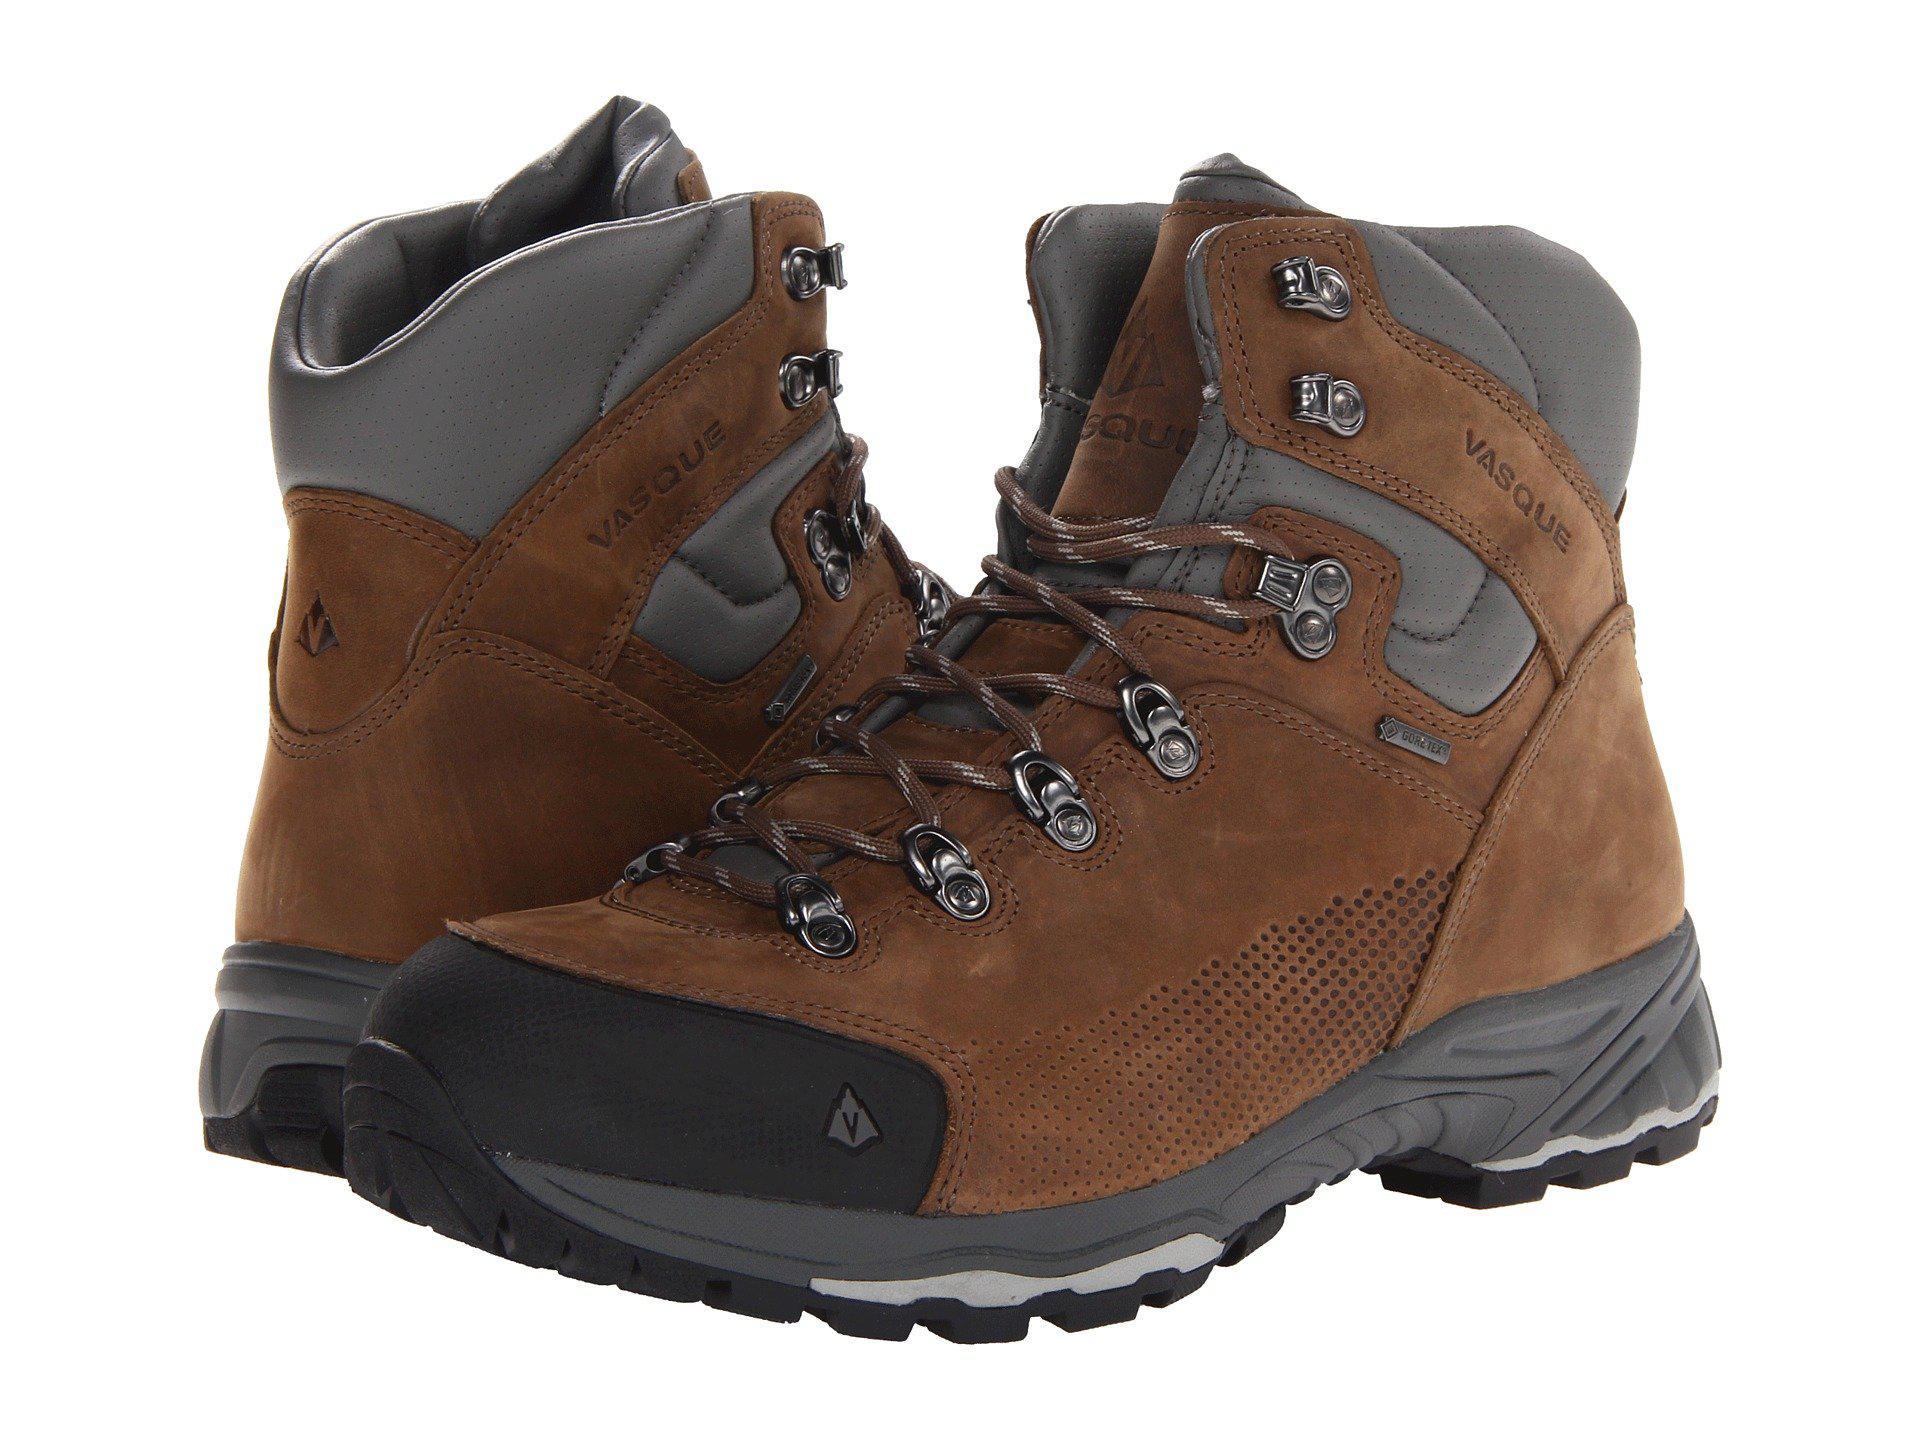 Vasque St. Elias Gtx (bungee Cord/neutral Gray) Menu0027s Hiking Boots ...